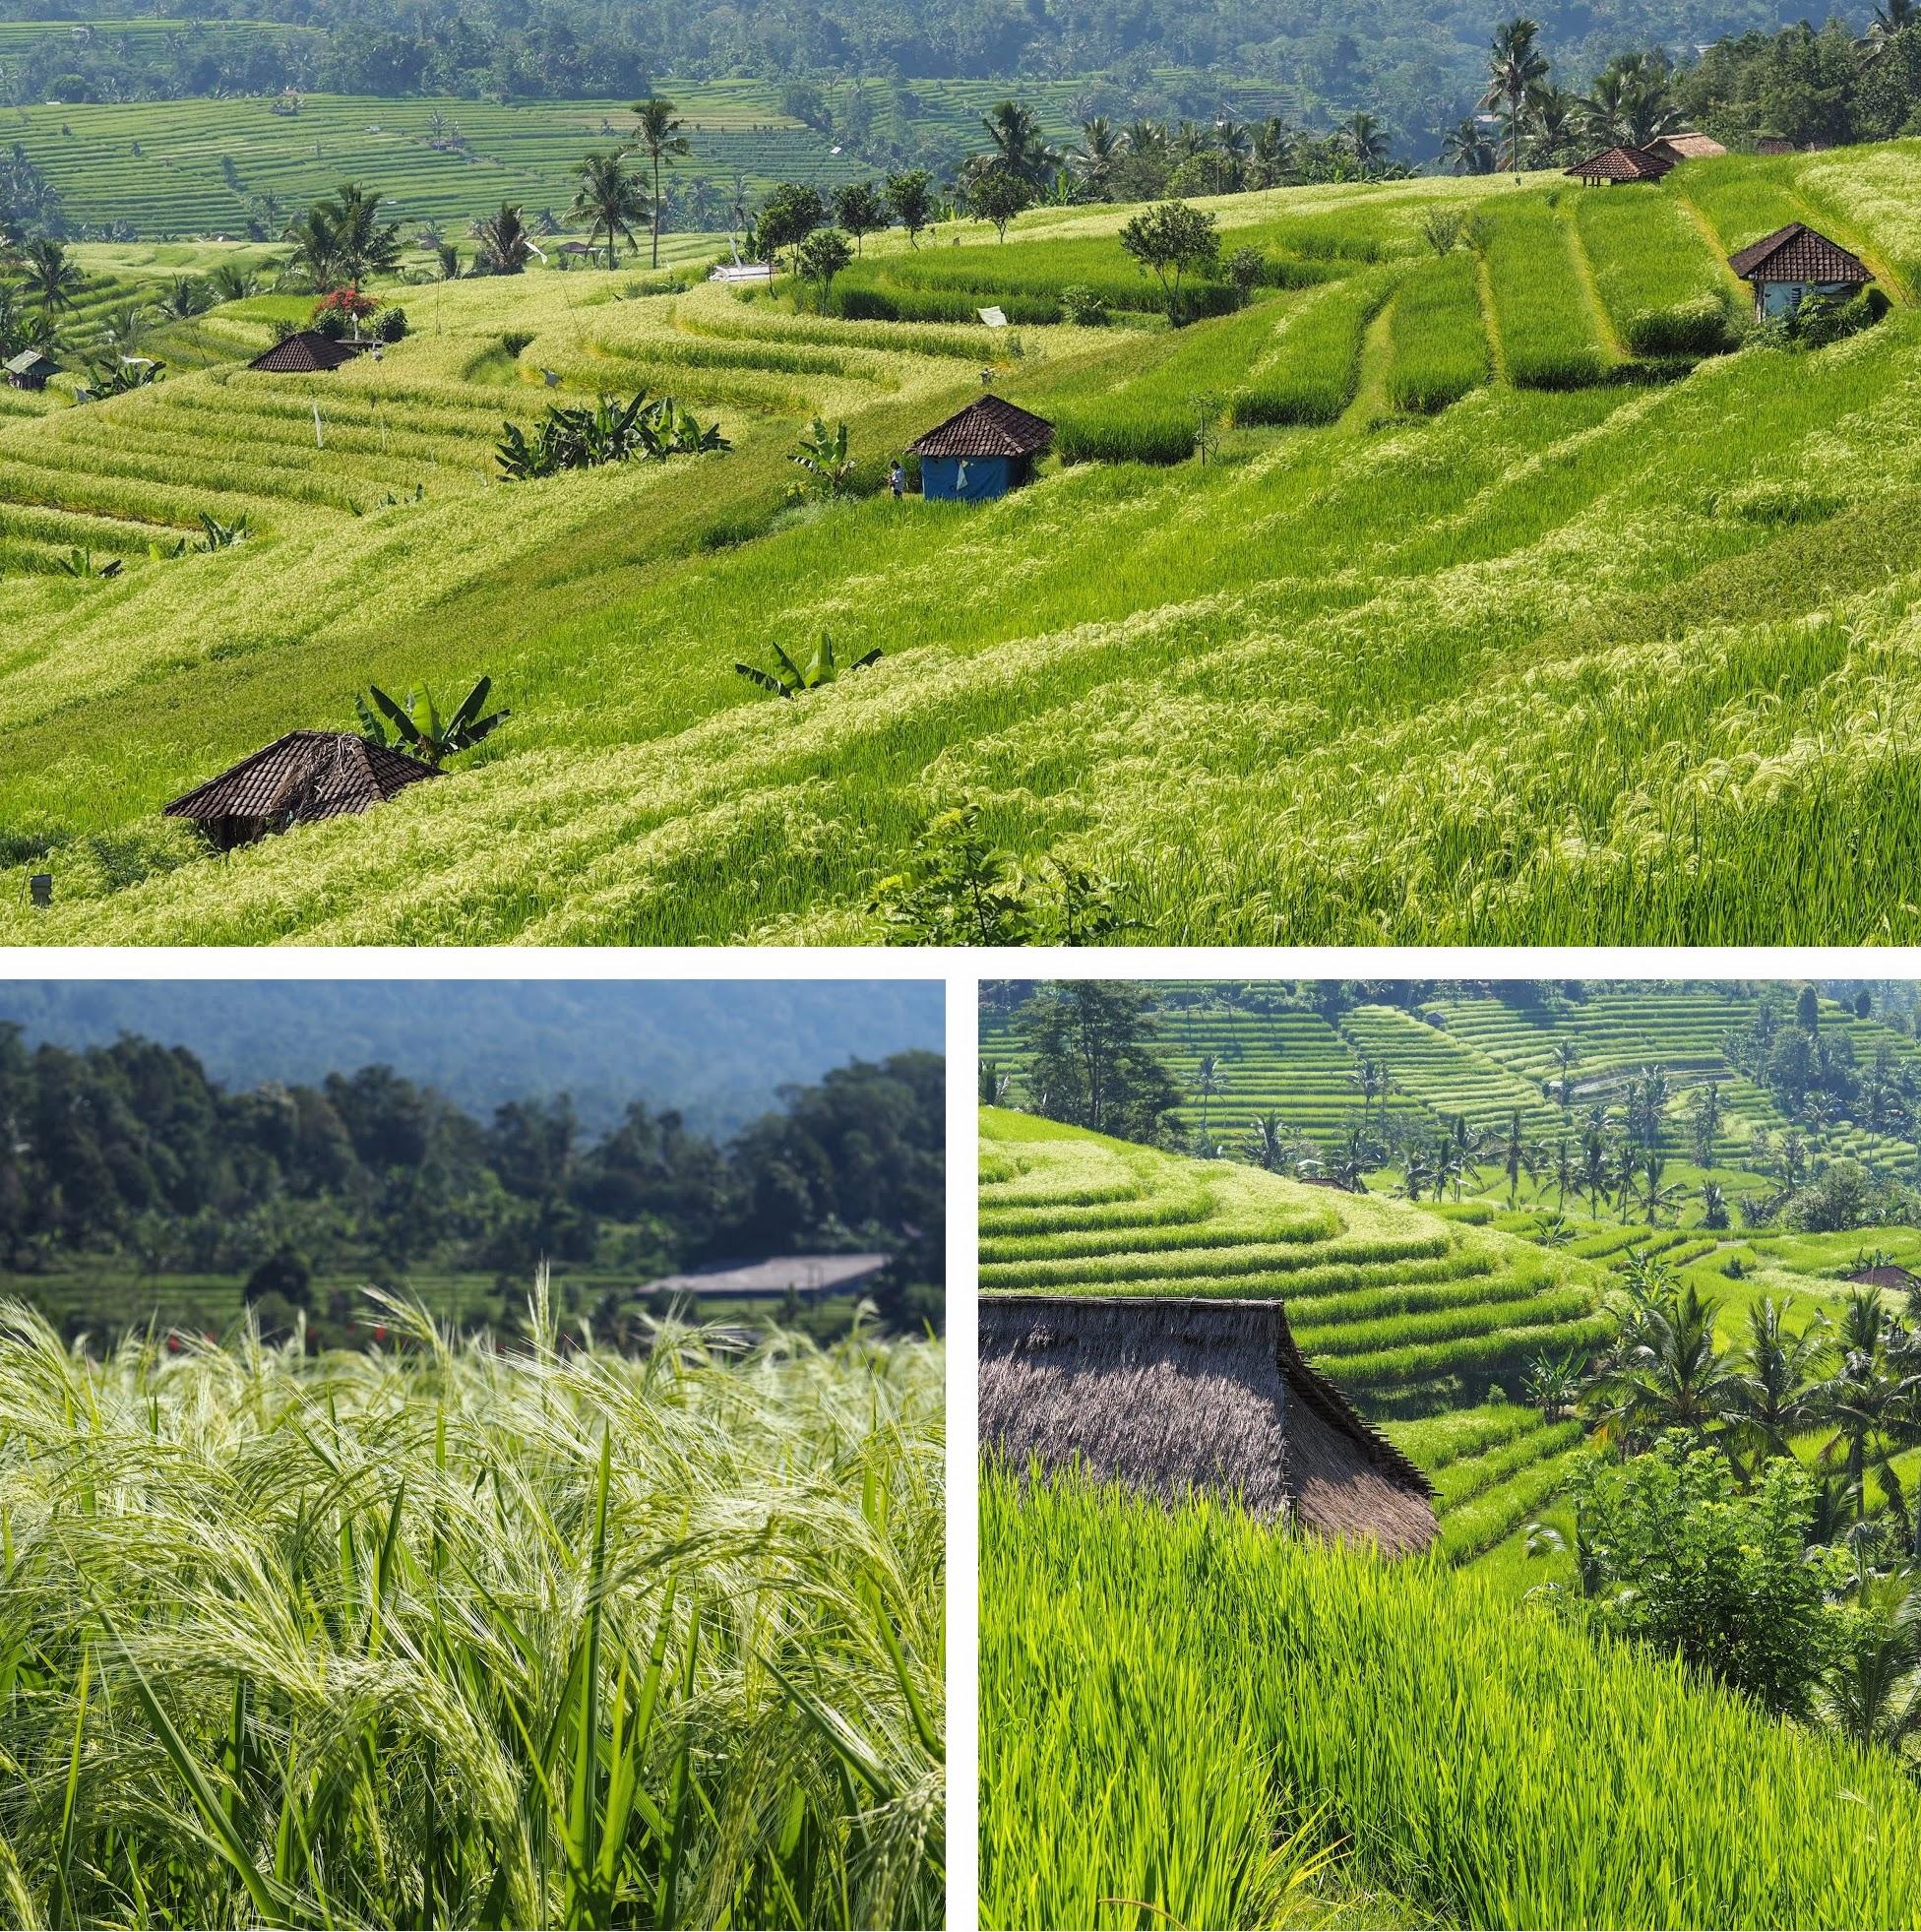 Jatiluwih Rice Terraces in central Bali